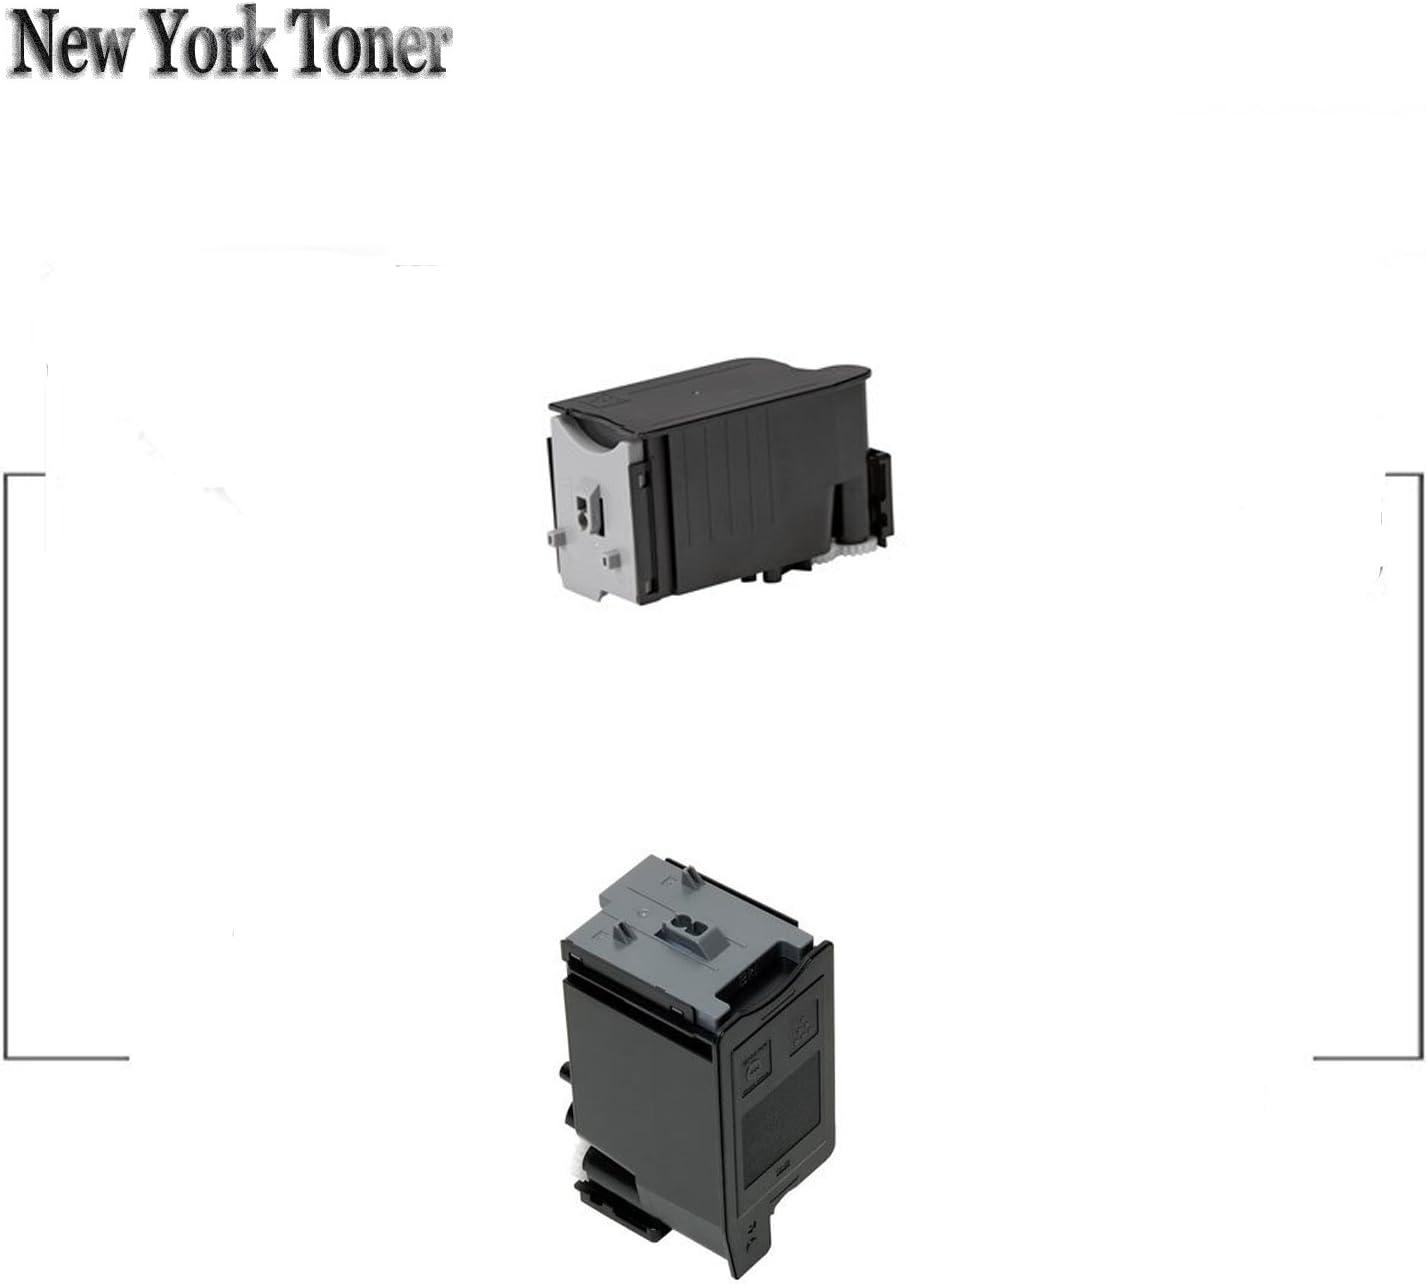 C300W MX C250 New York TonerTM New Compatible 8 Pack MX-C30NTB High Yield Toner for Sharp Black C300P C301W